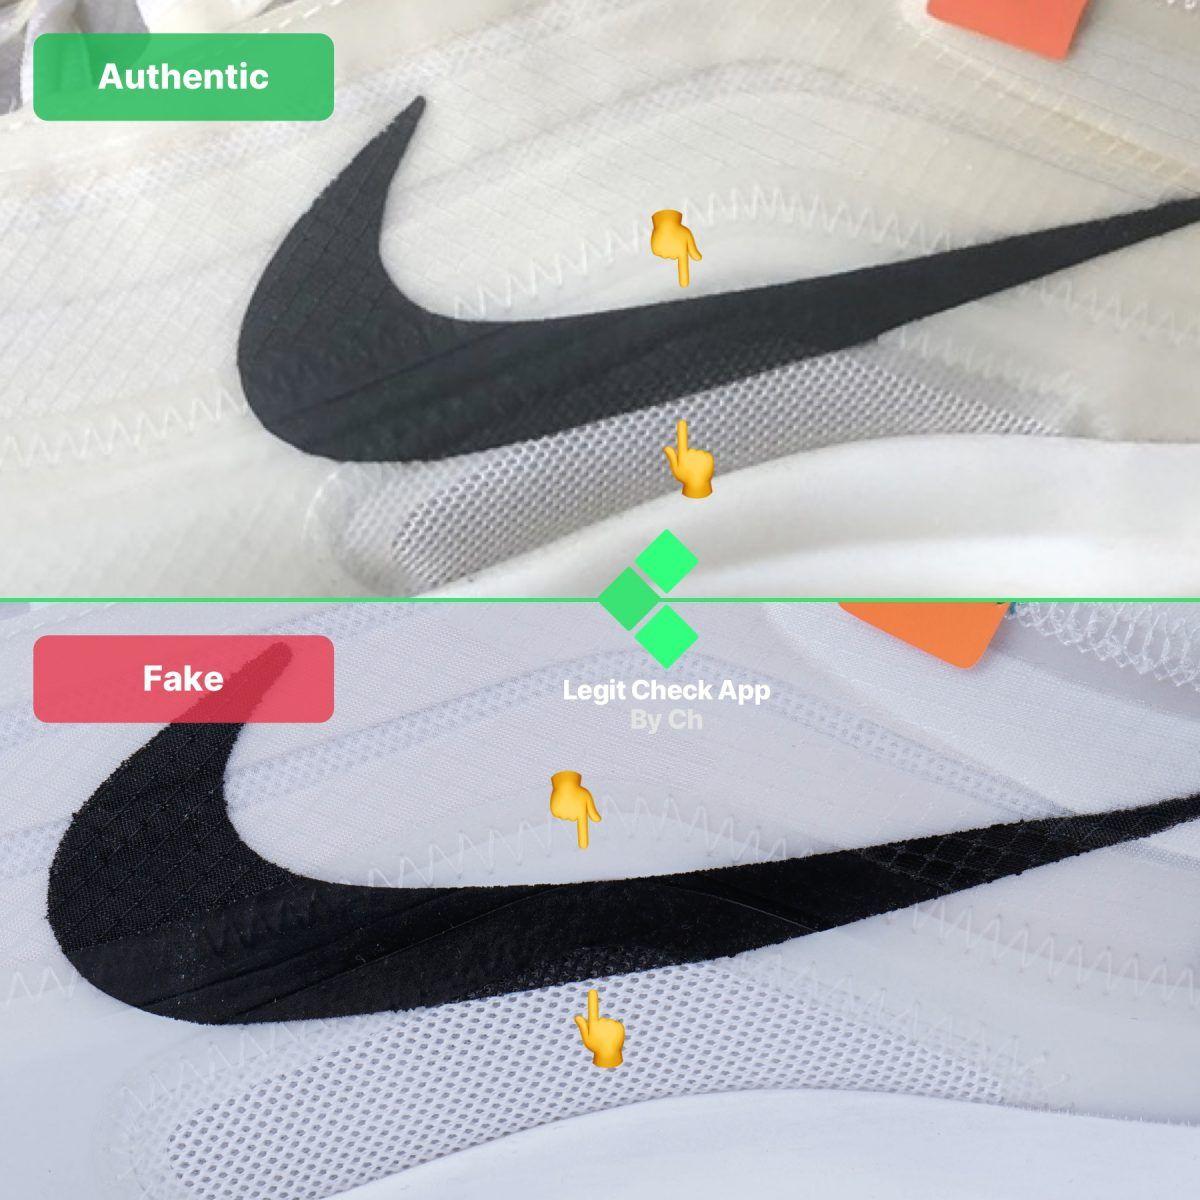 OffWhite Air Max 97 OG AJ4585100 Real Vs Fake Guide in